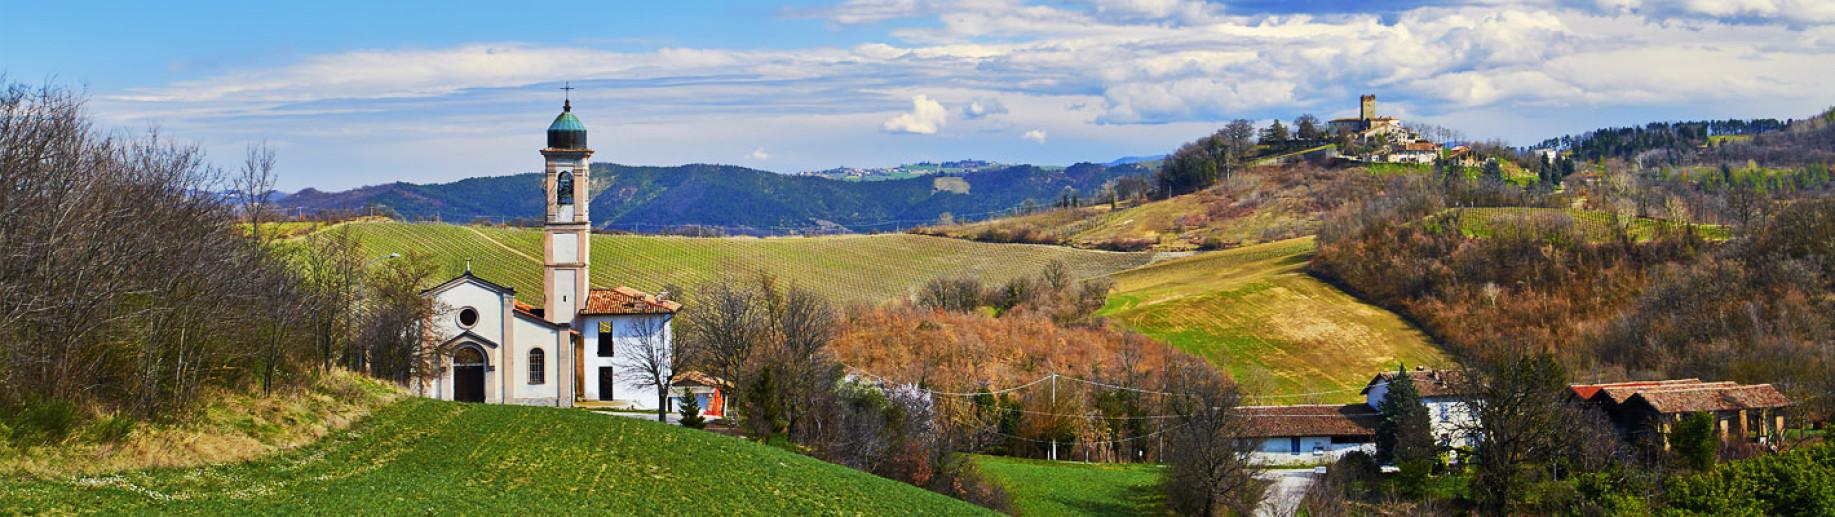 Borgo Priolo